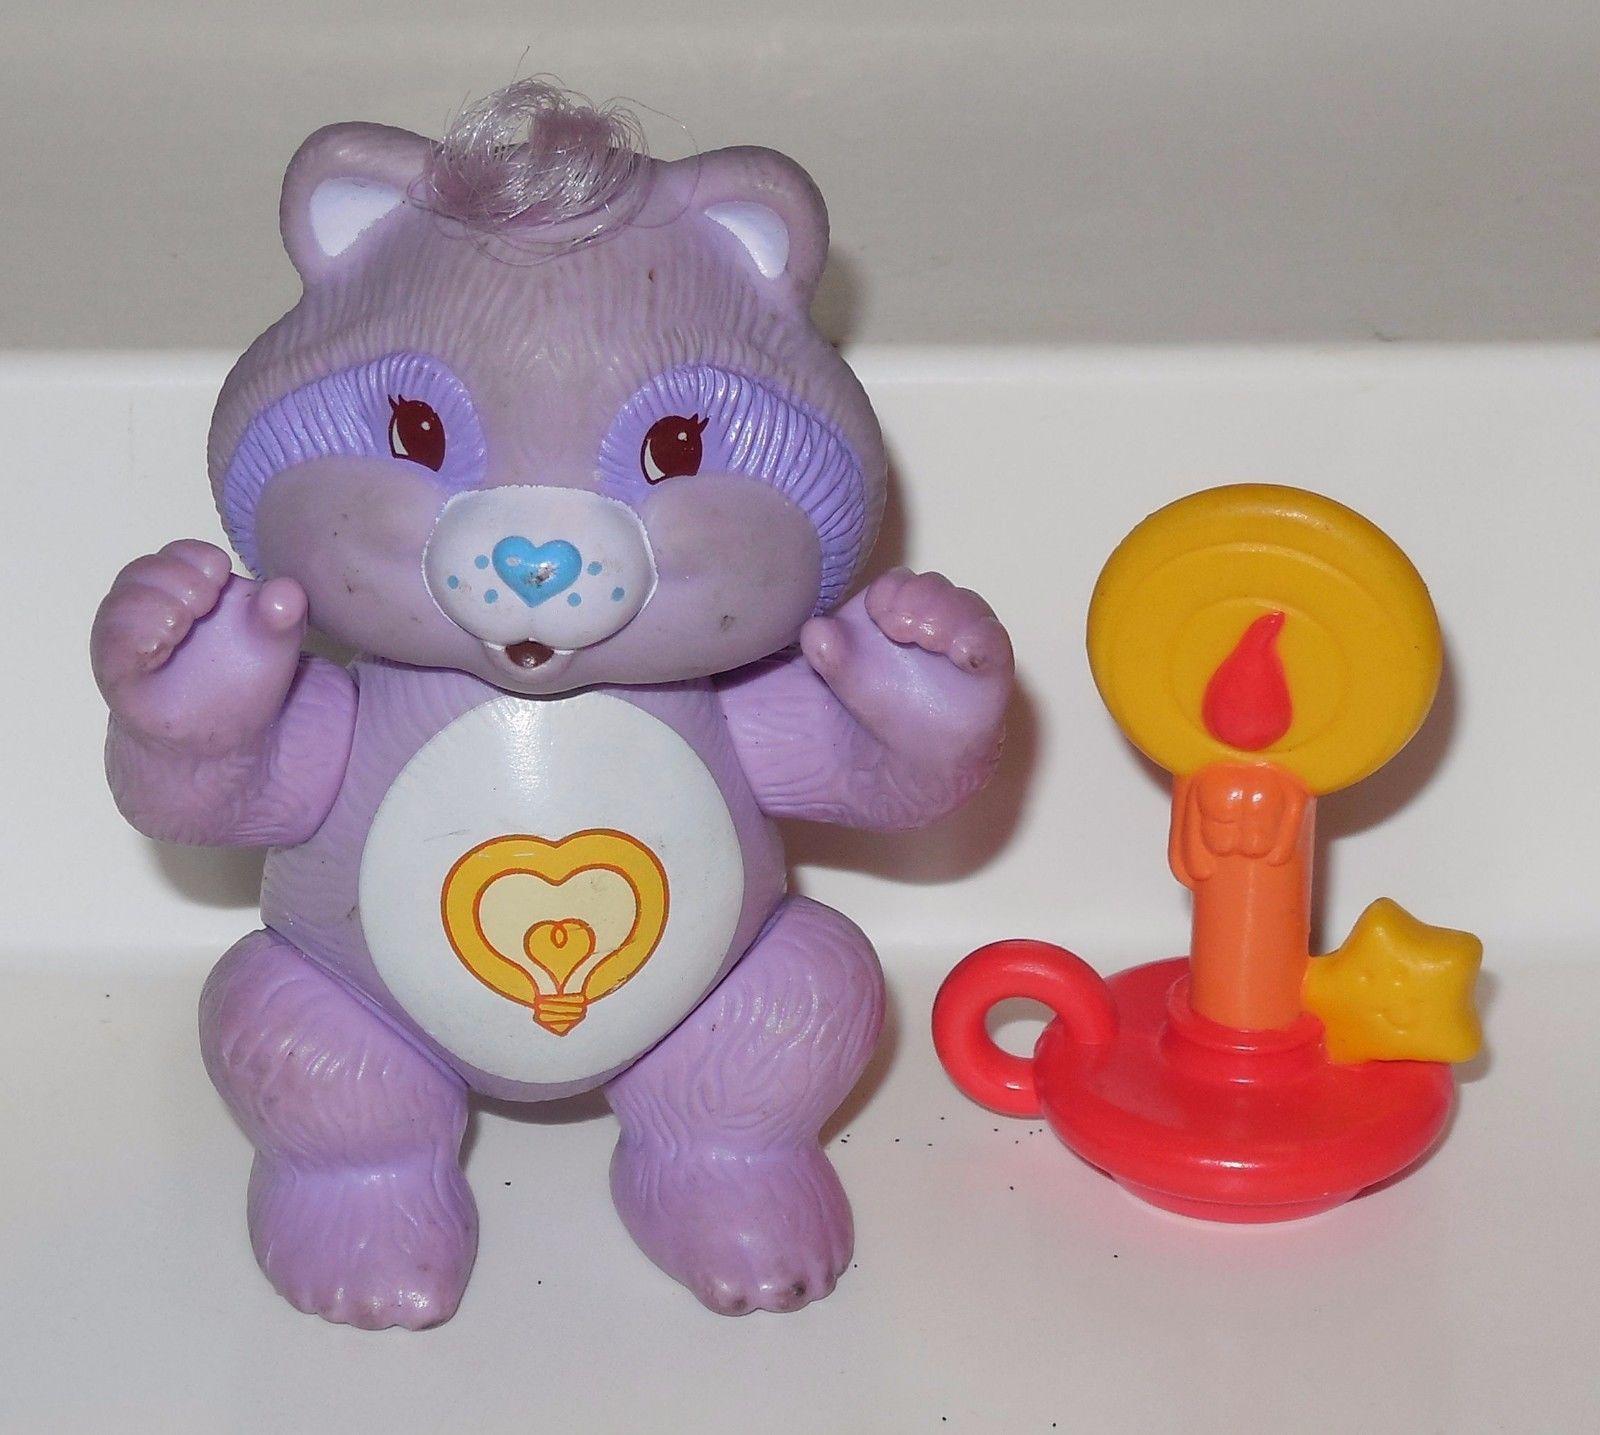 Bright Heart Raccoon Miniature Figurine Vintage Care Bears Cousin PVC Mini Figure